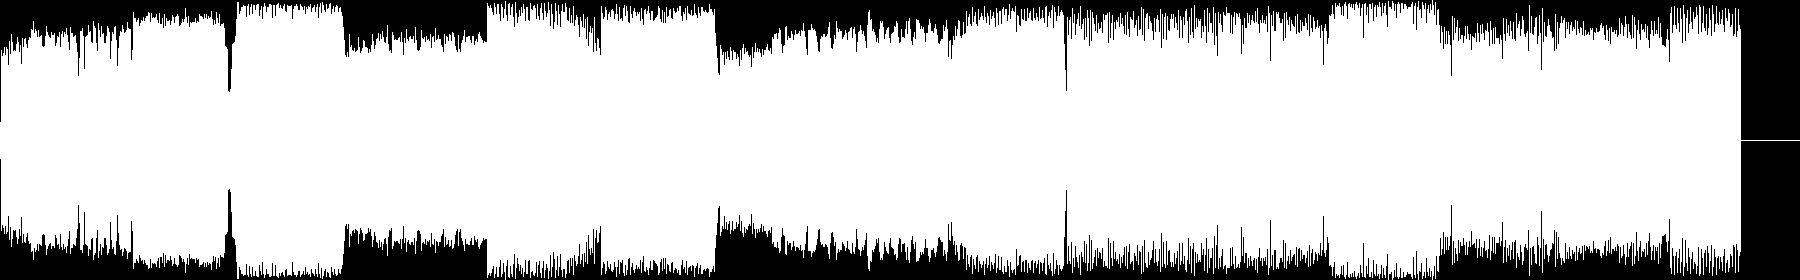 Reggaeton 2018 audio waveform